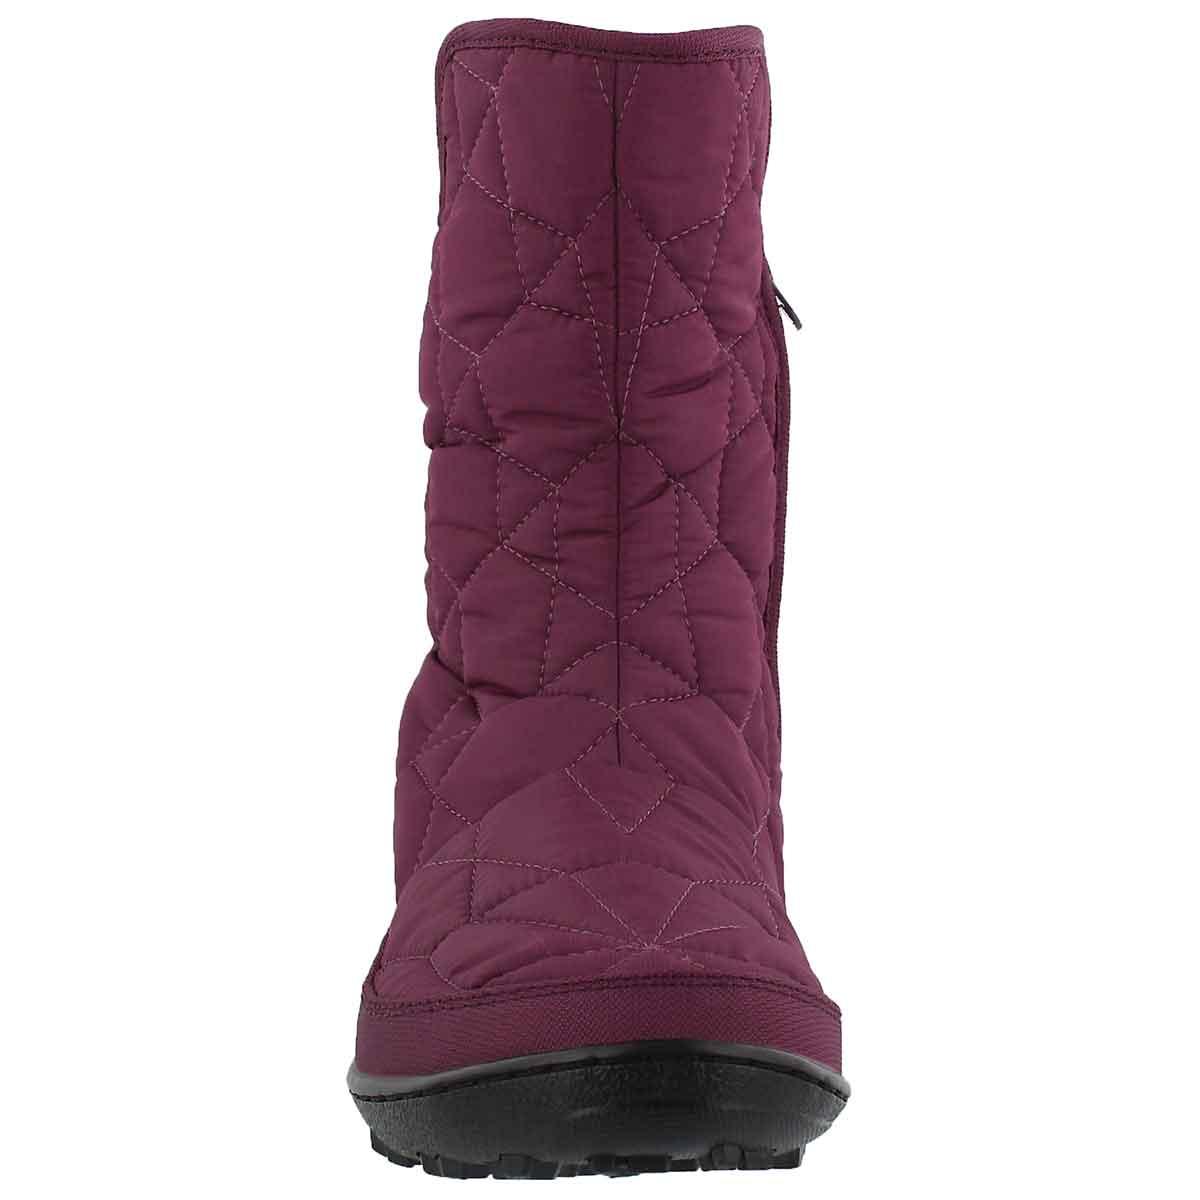 Lds Minx Slip II rsp pull on winter boot